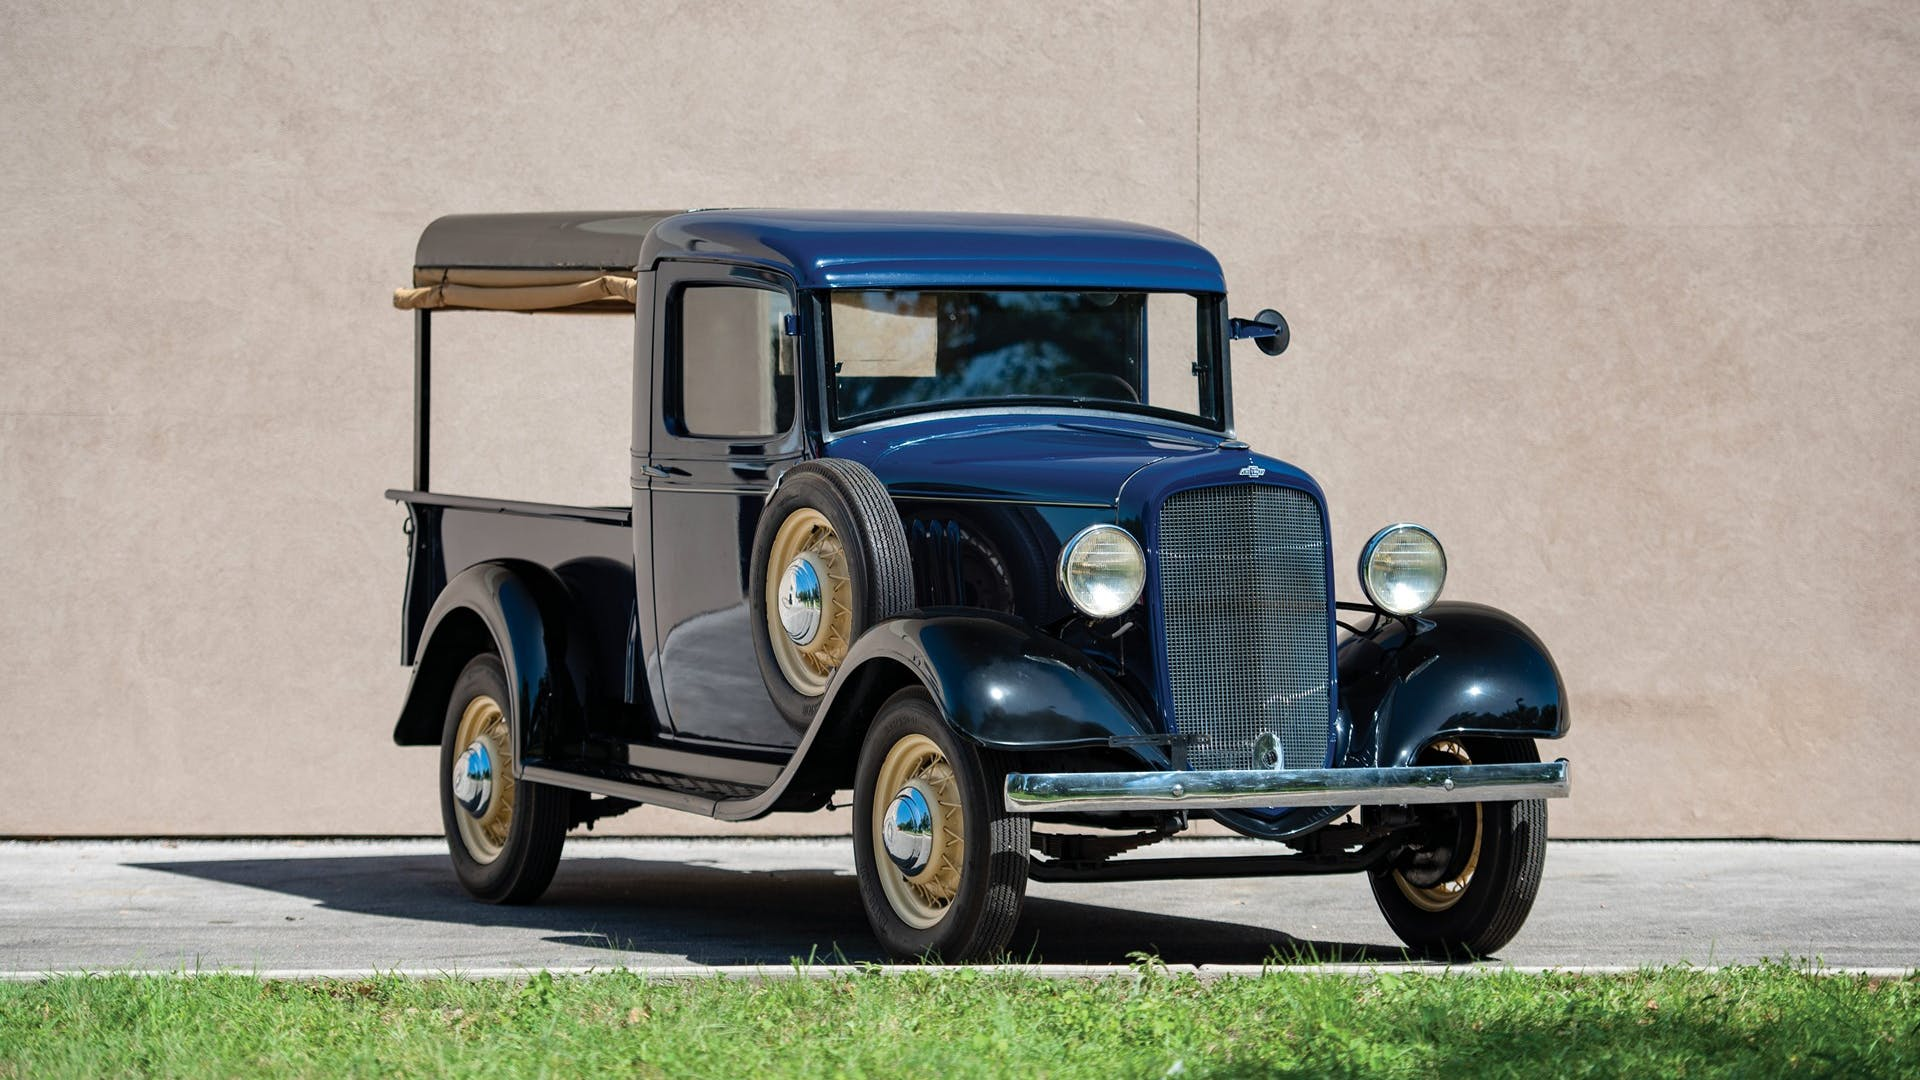 1935 Chevrolet Series Eb Canopy Truck